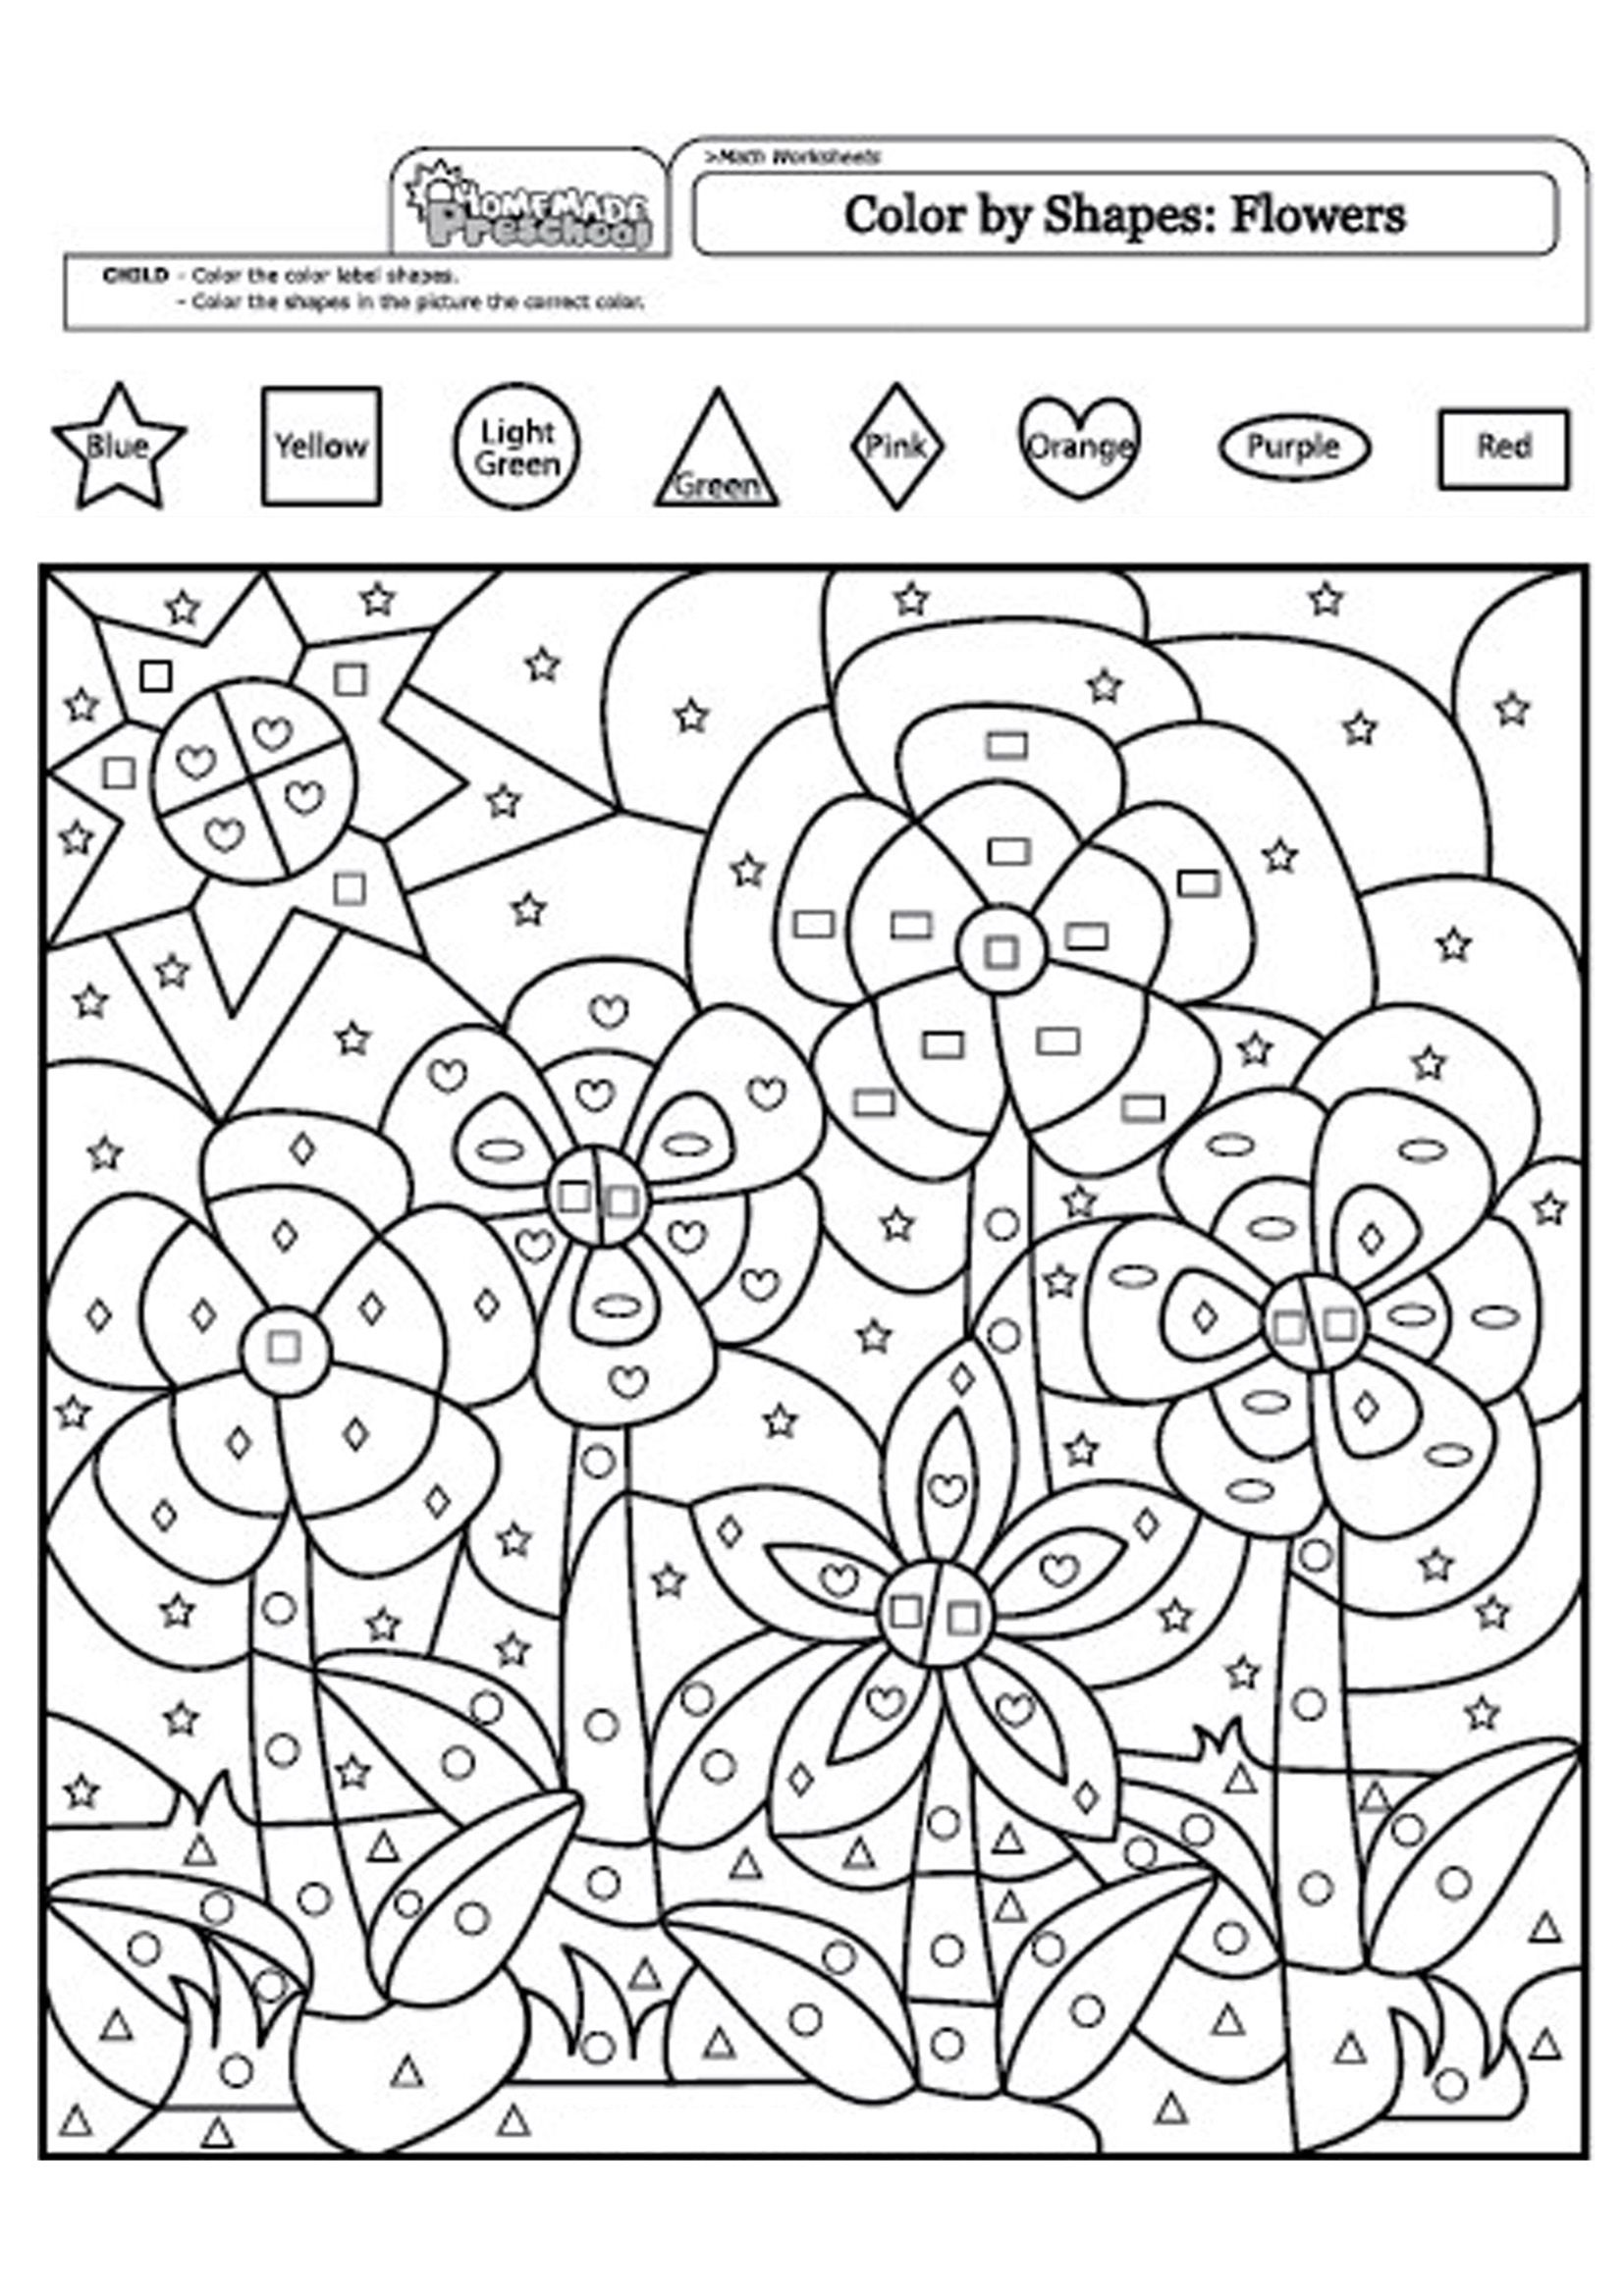 Https S3 Eu Central 1 Amazonaws Com Img Sovenok Co Uk Flowers Logic Colour Logic Colour Flower 001 Jpg Shape Coloring Pages Coloring Pages Color By Numbers